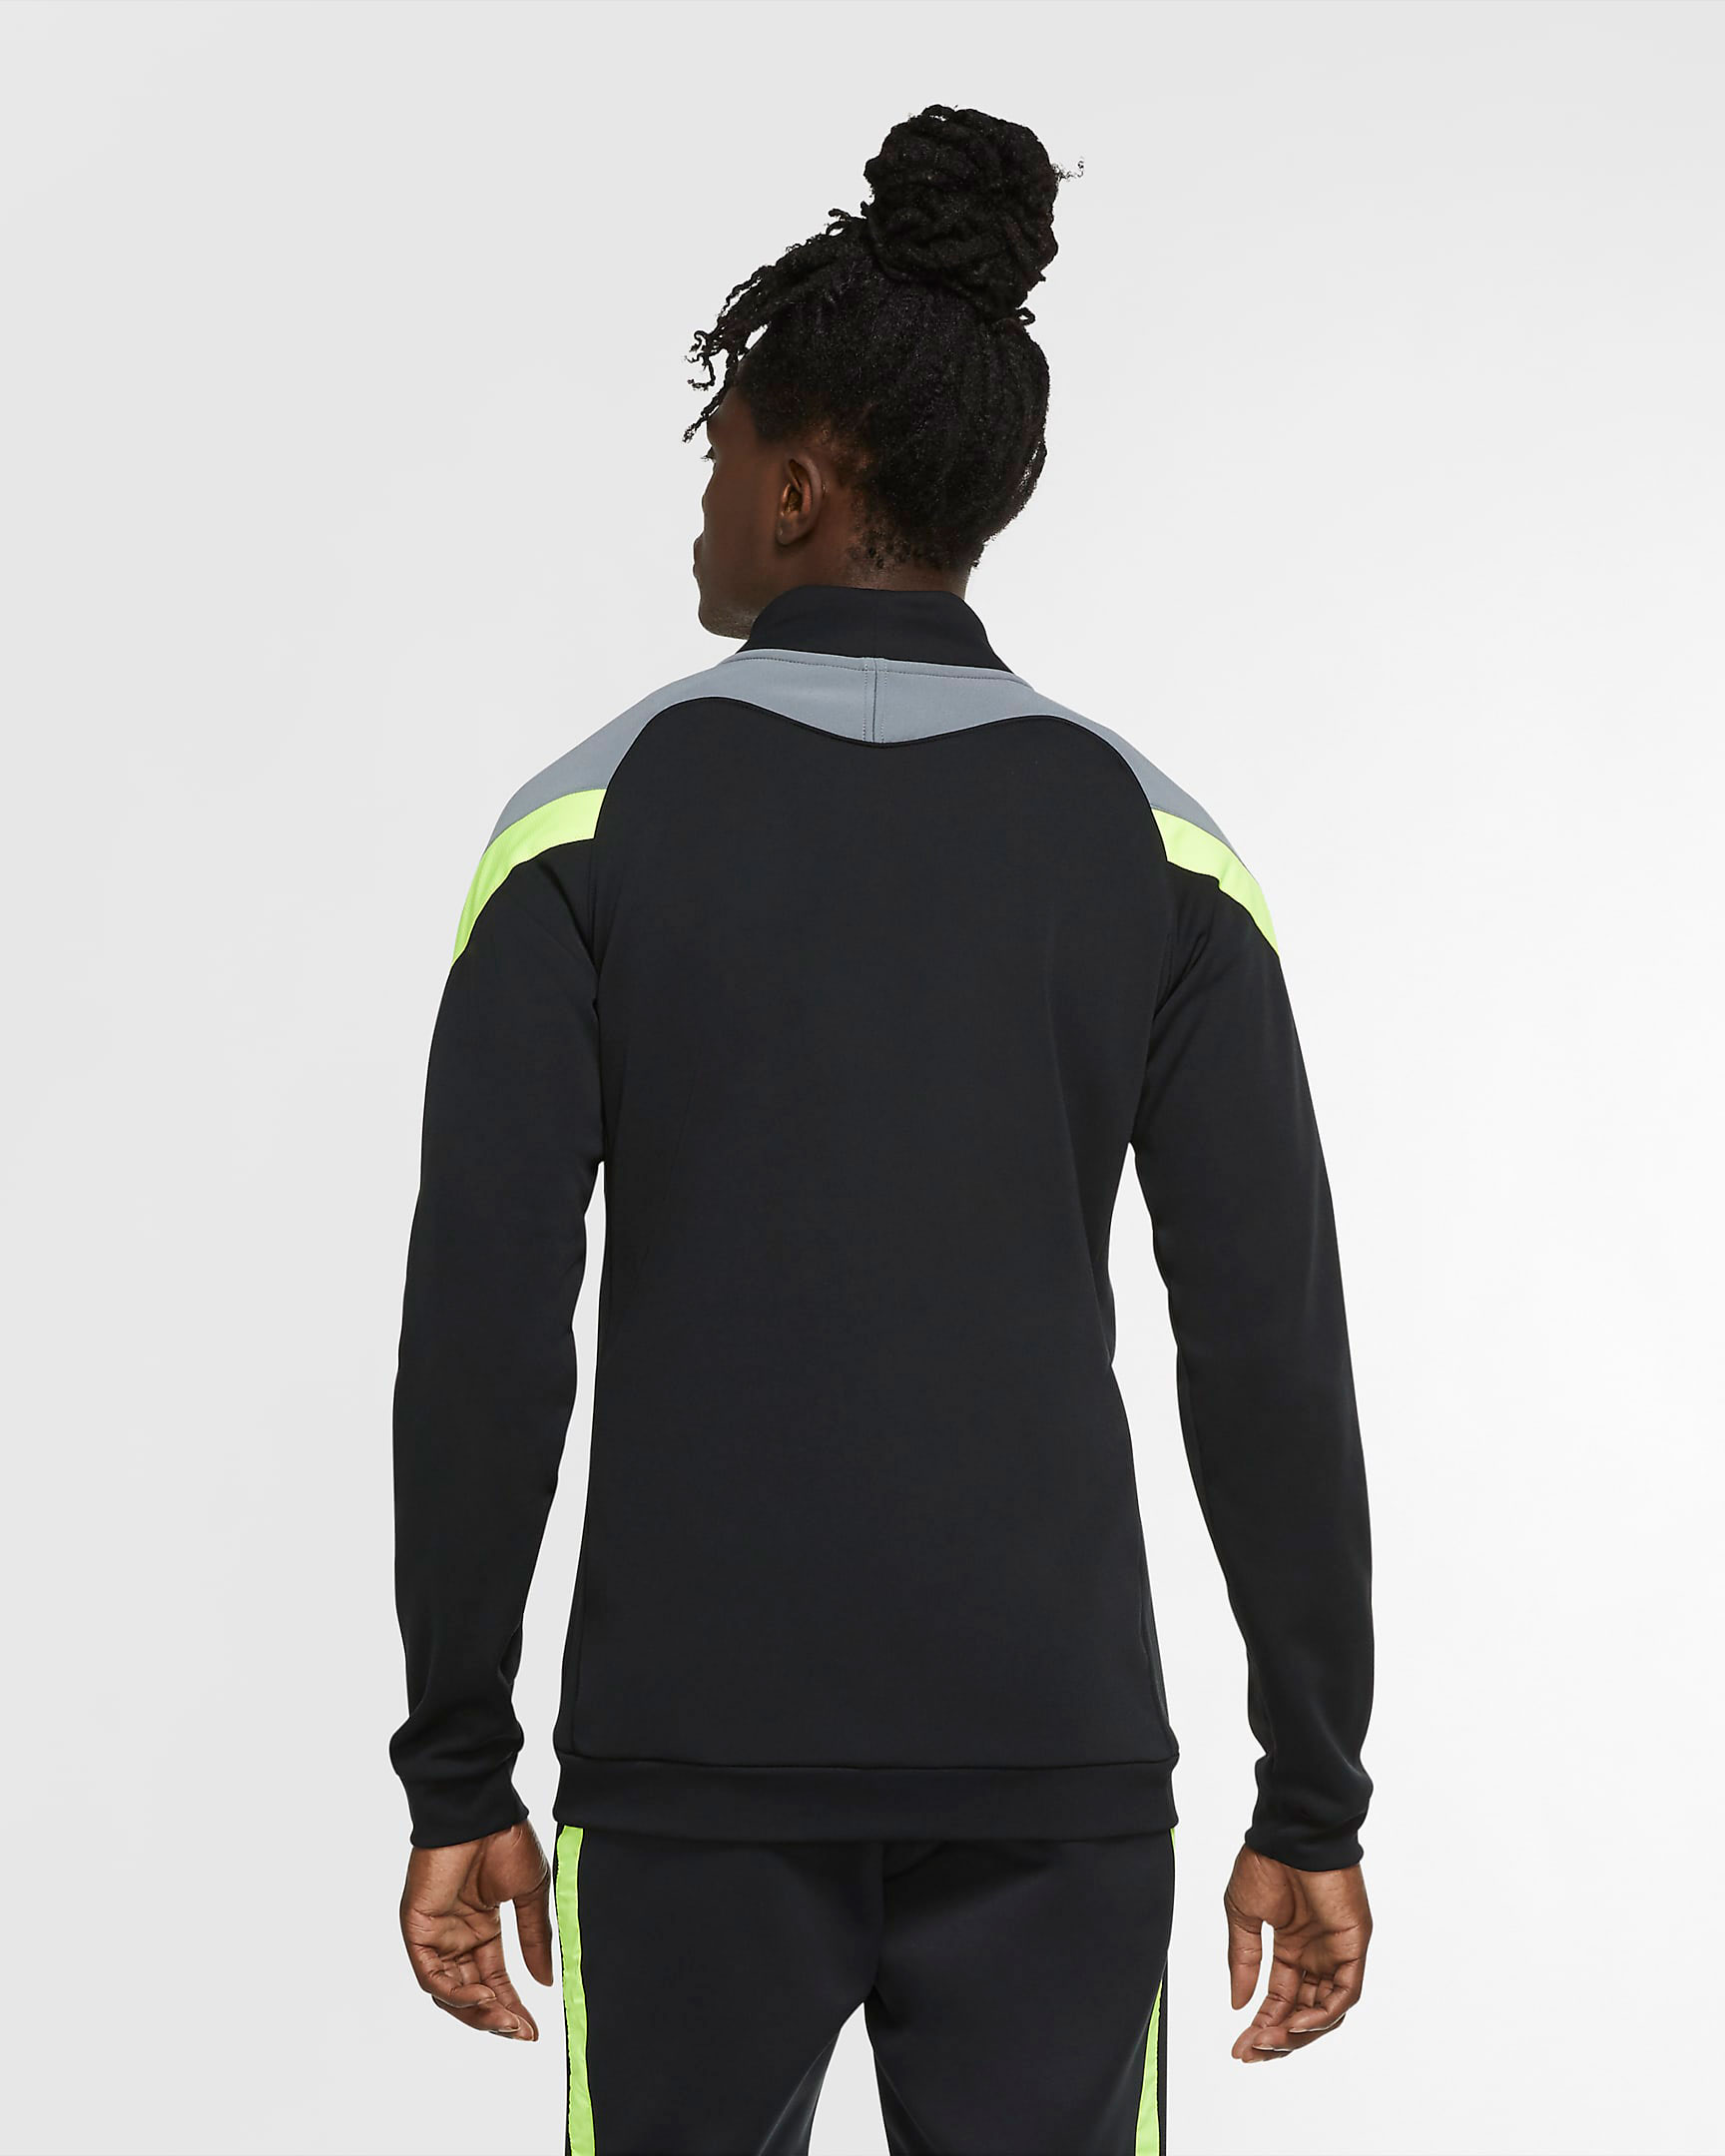 nike-air-max-95-neon-og-2020-track-jacket-3